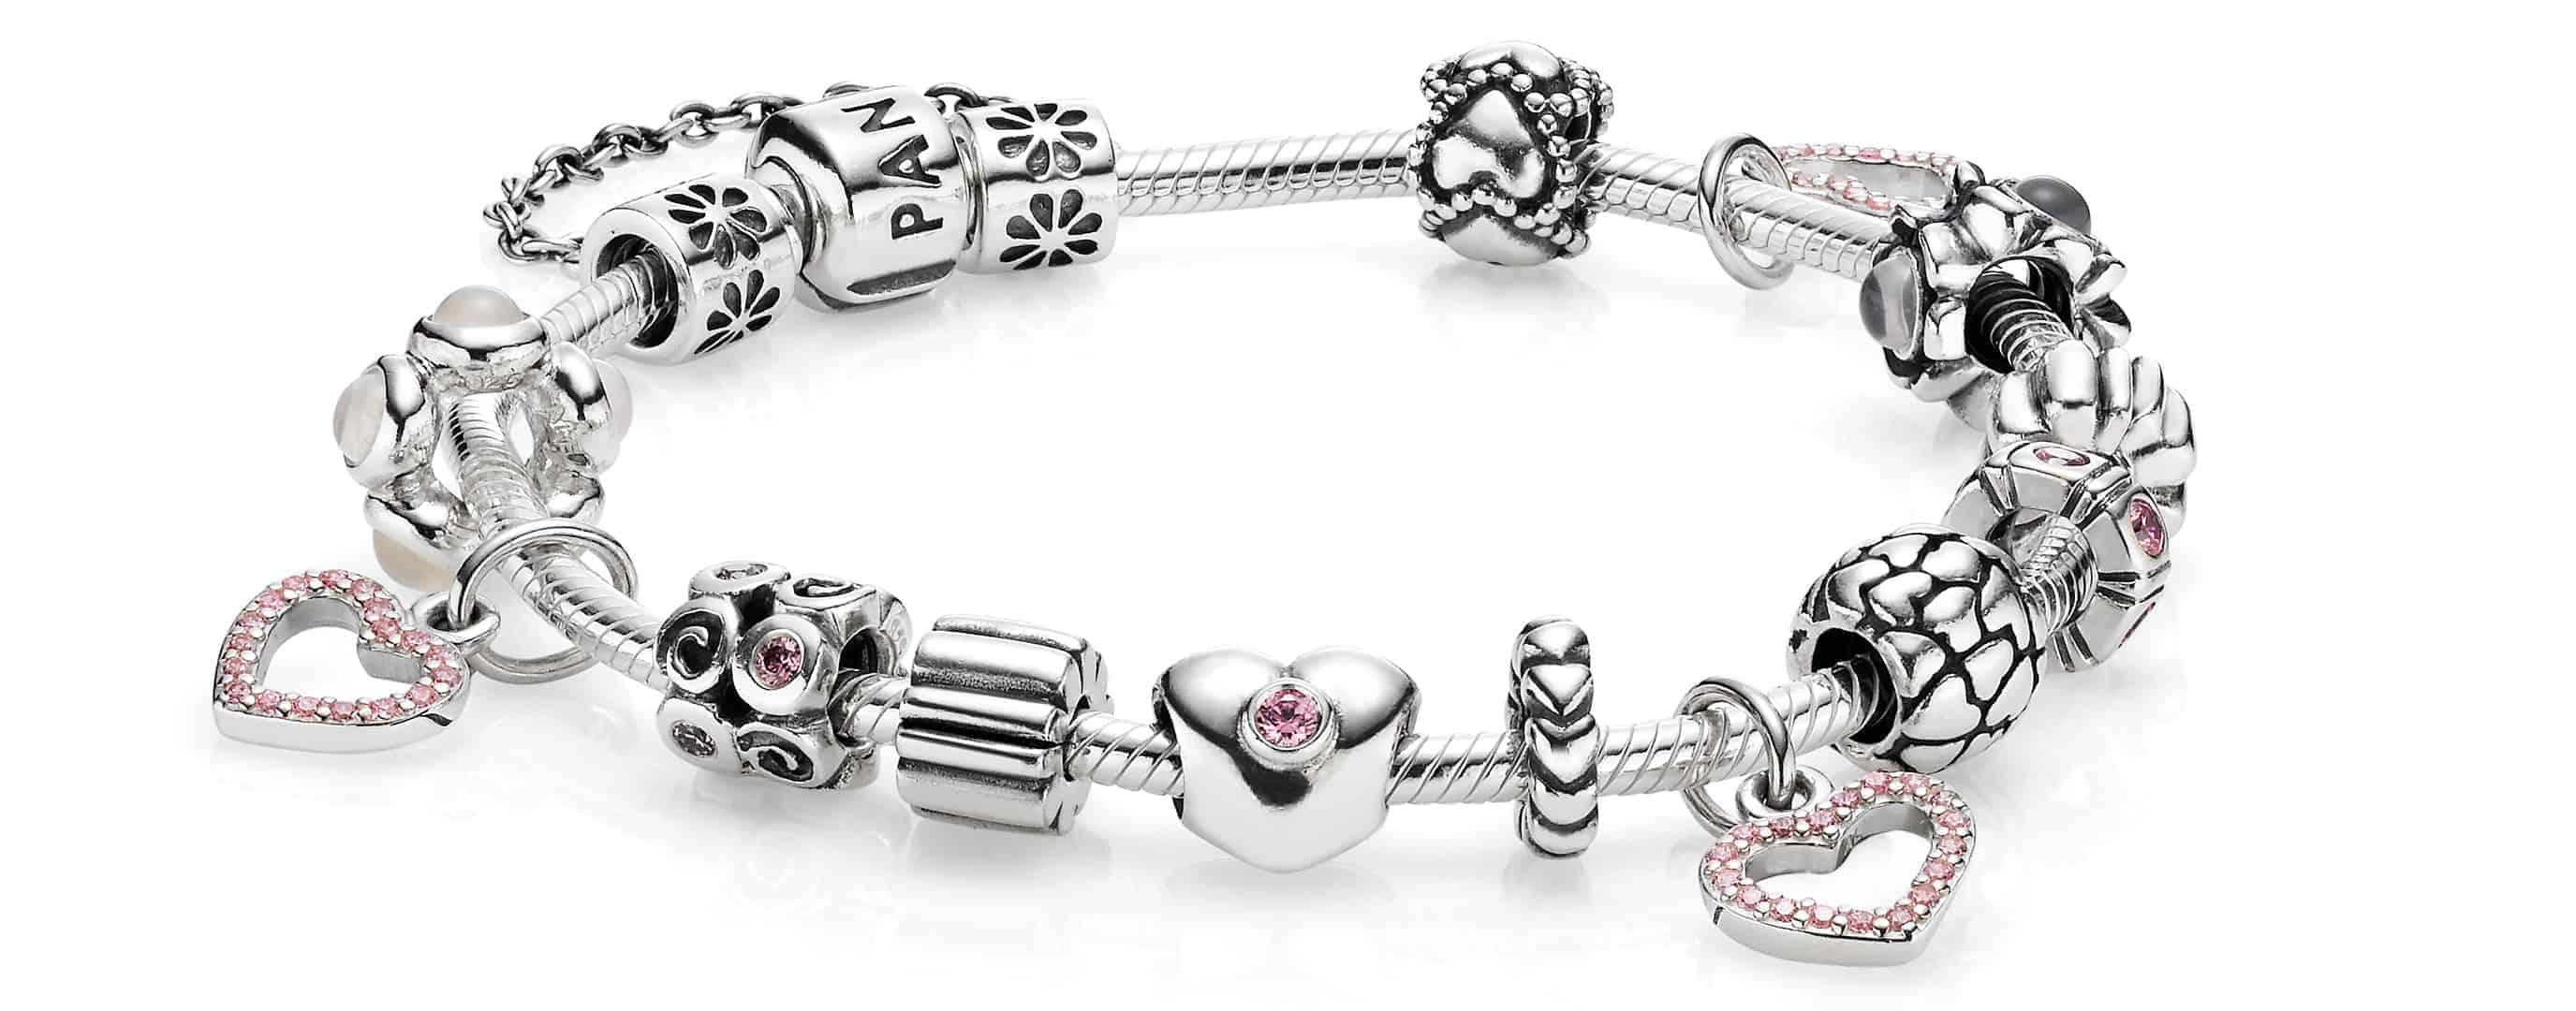 Pandora Bracelet Design Ideas price 36500 using pandora charms Pandora Bangle Charm Bracelet Bracelets Bangles Design Ideas